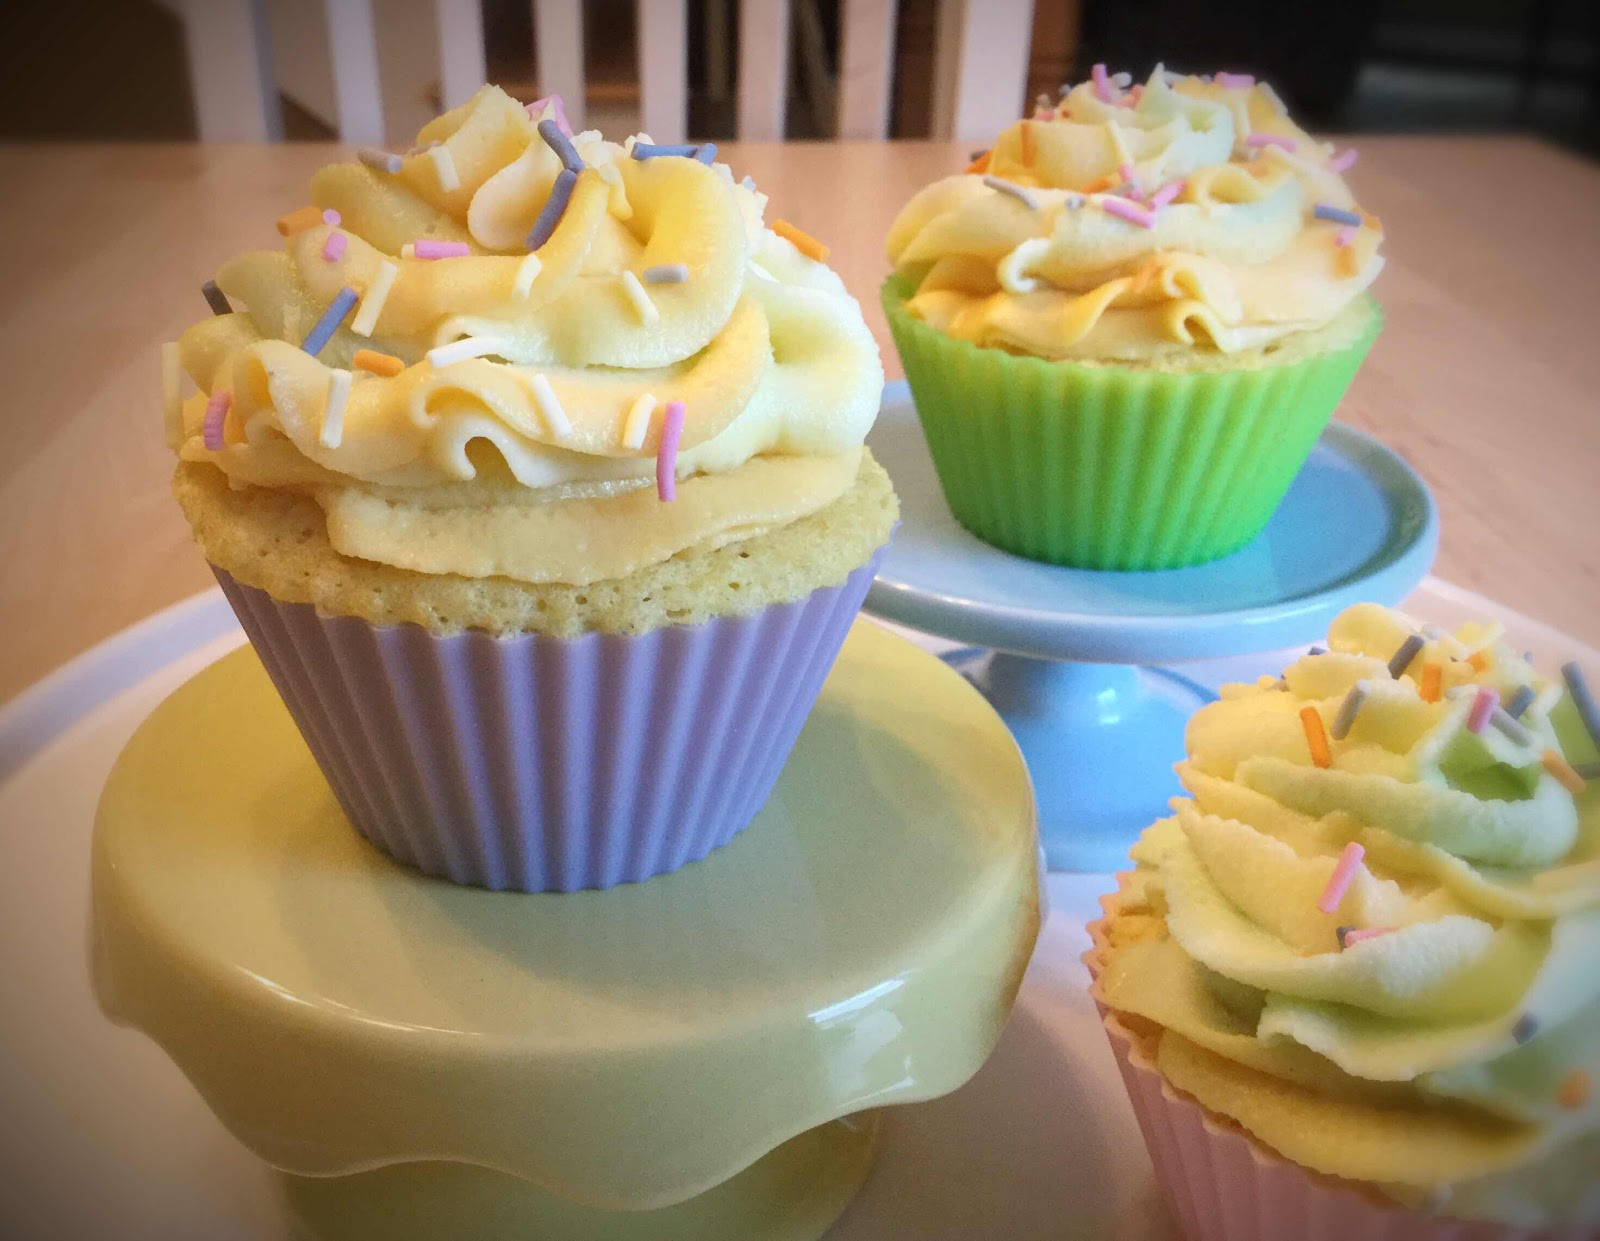 40 Second Keto Cupcakes